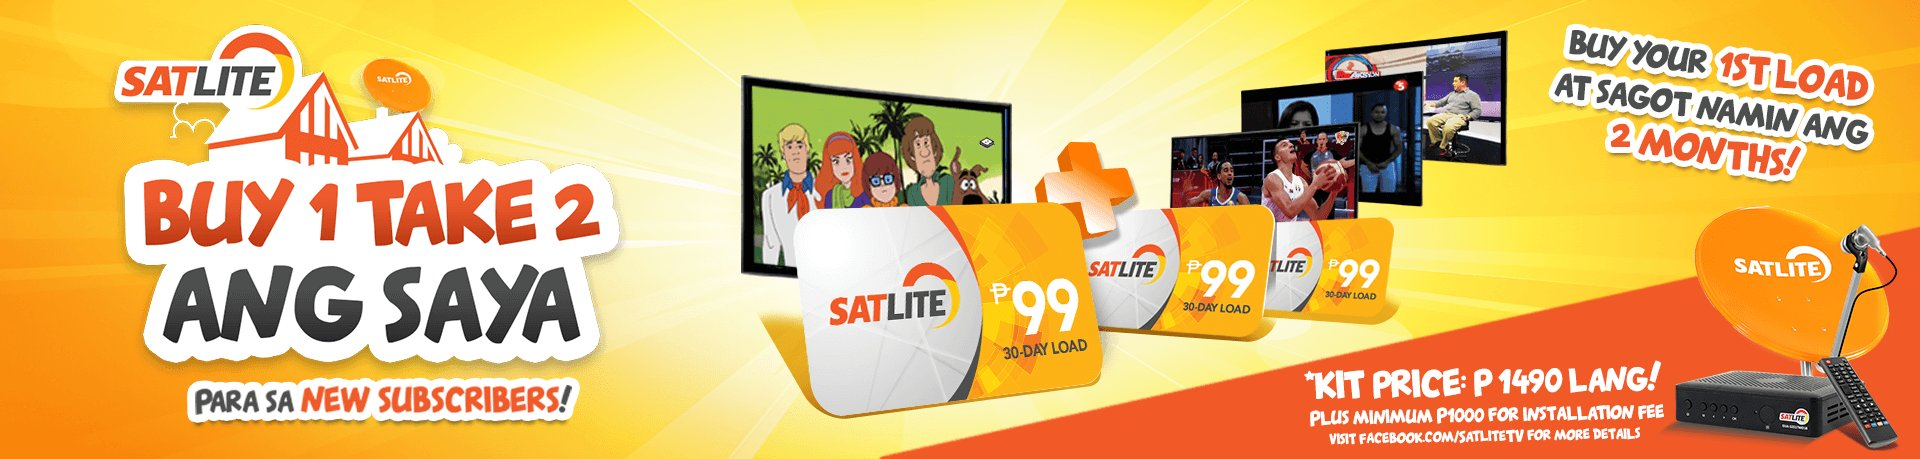 satlite promo desktop banner